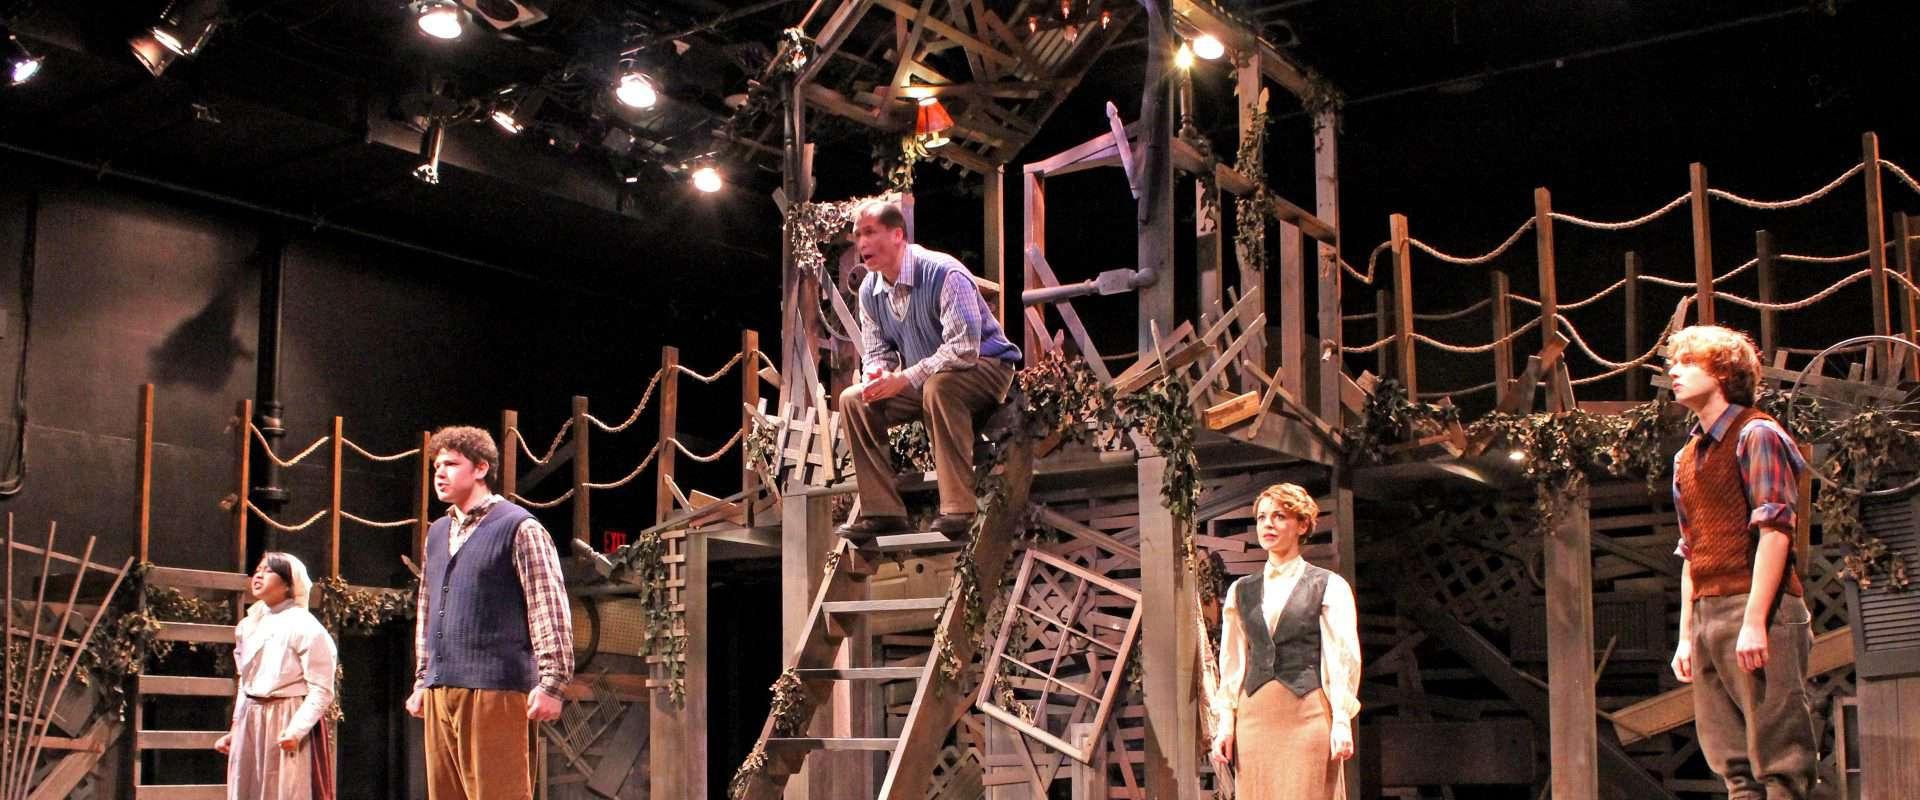 Study Theatre Education at WPU